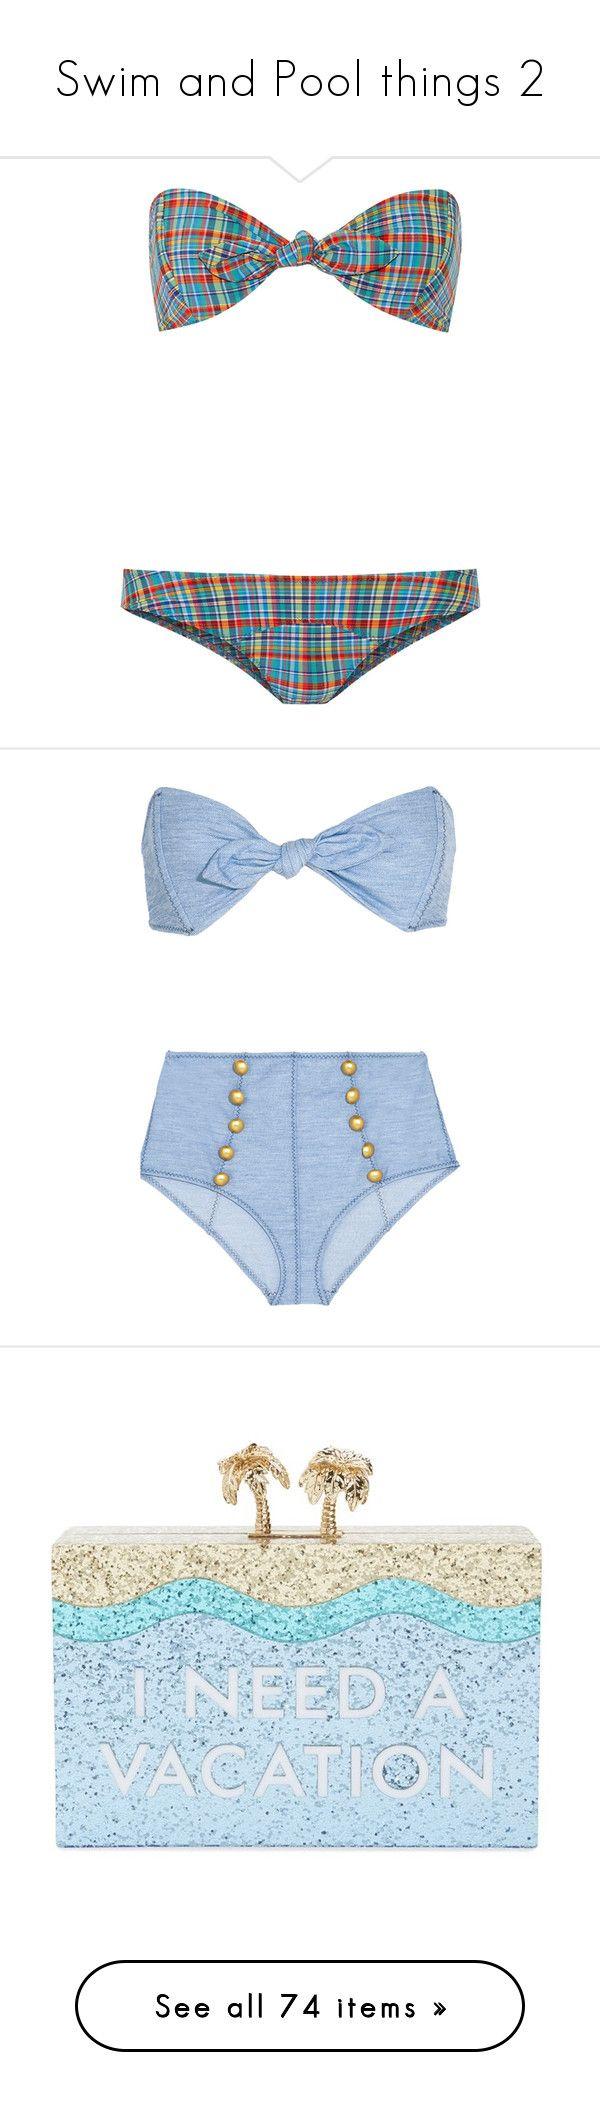 """Swim and Pool things 2"" by flirtydzines ❤ liked on Polyvore featuring swimwear, bikinis, light blue, bandeau bikini top, pinup bikini, tie-dye swimwear, bikini two piece, pinup swimwear, bikini and lisa marie fernandez"